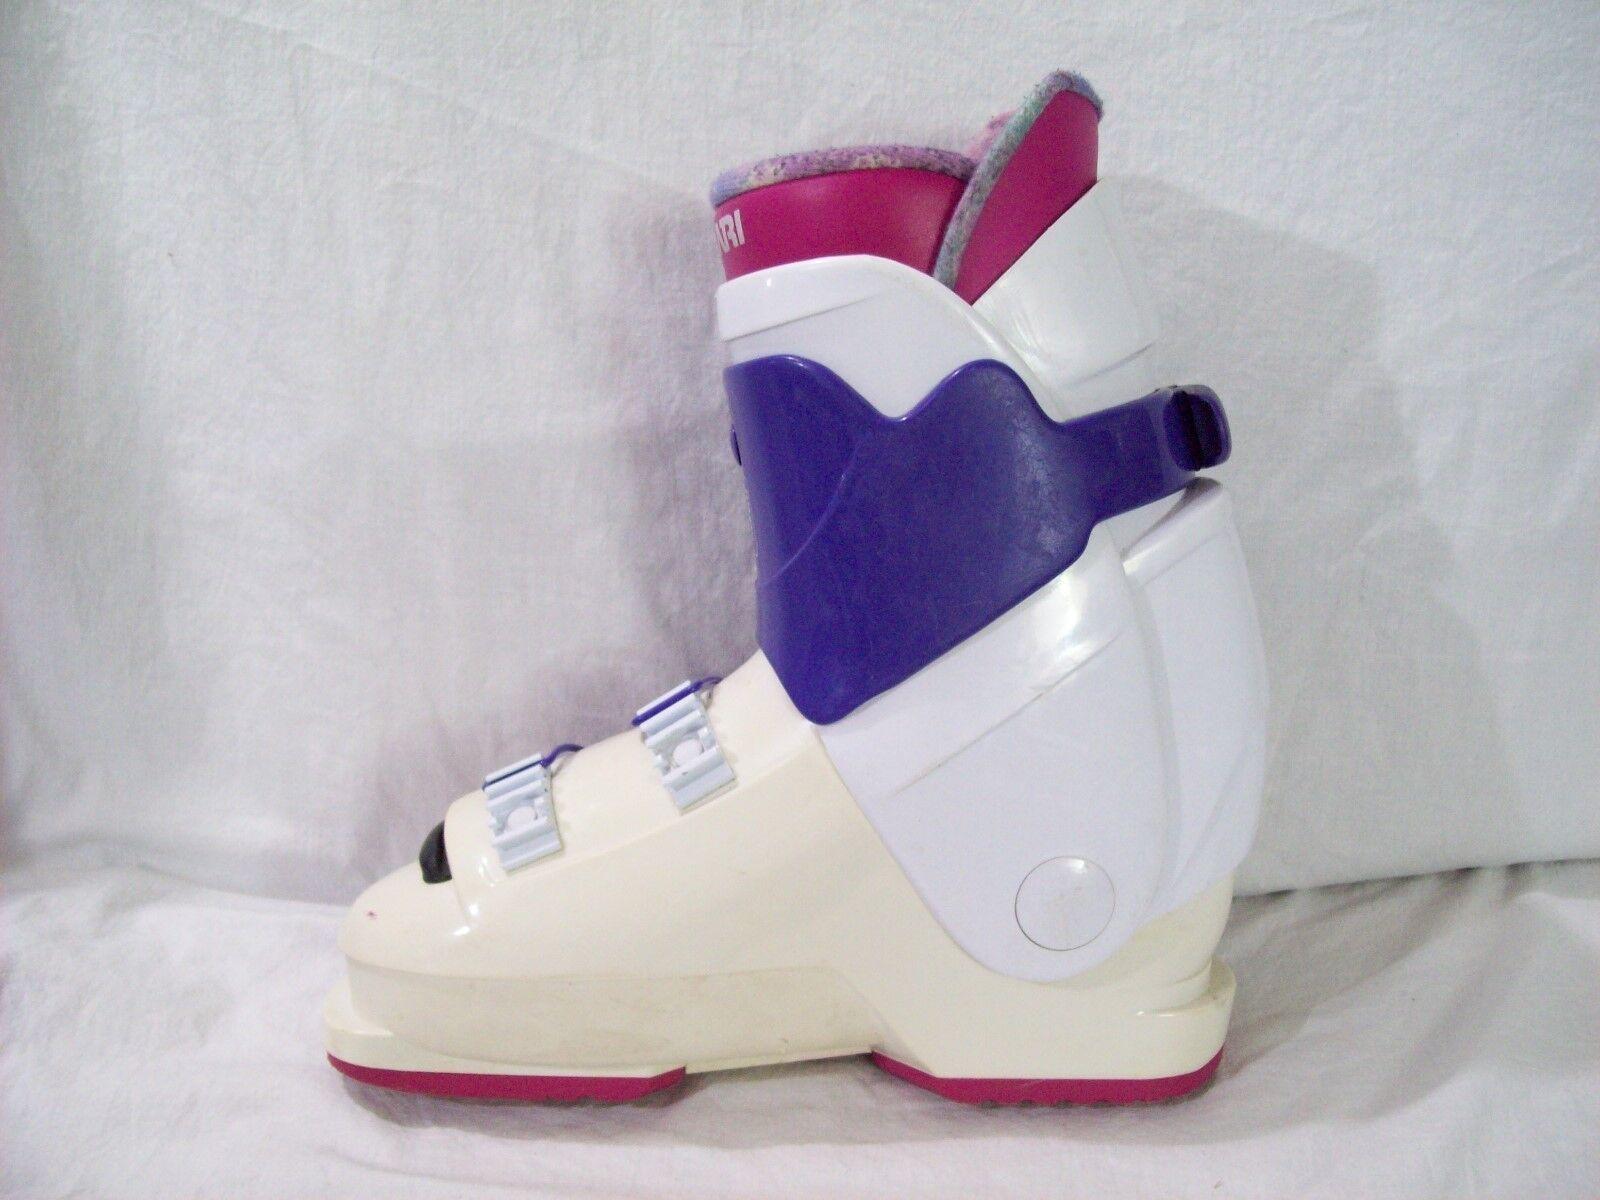 Munari Munari Munari ski Stiefel ME Central Entry Line 100 Wrap Adjustment Rosa Weiß sz 281MM a3e5e3